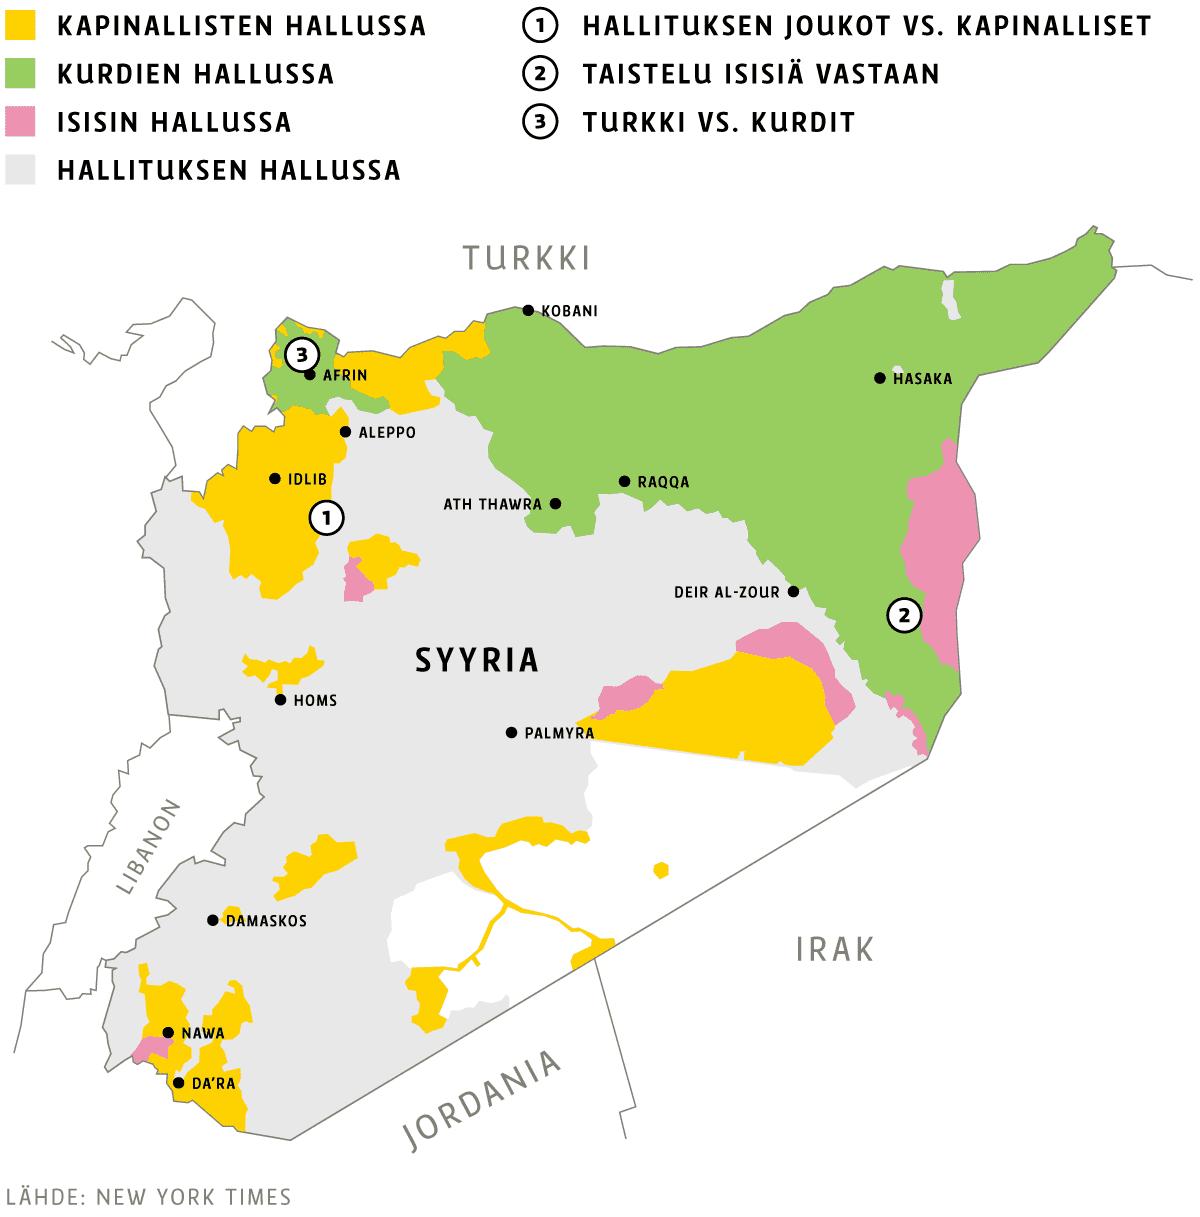 Infokartta